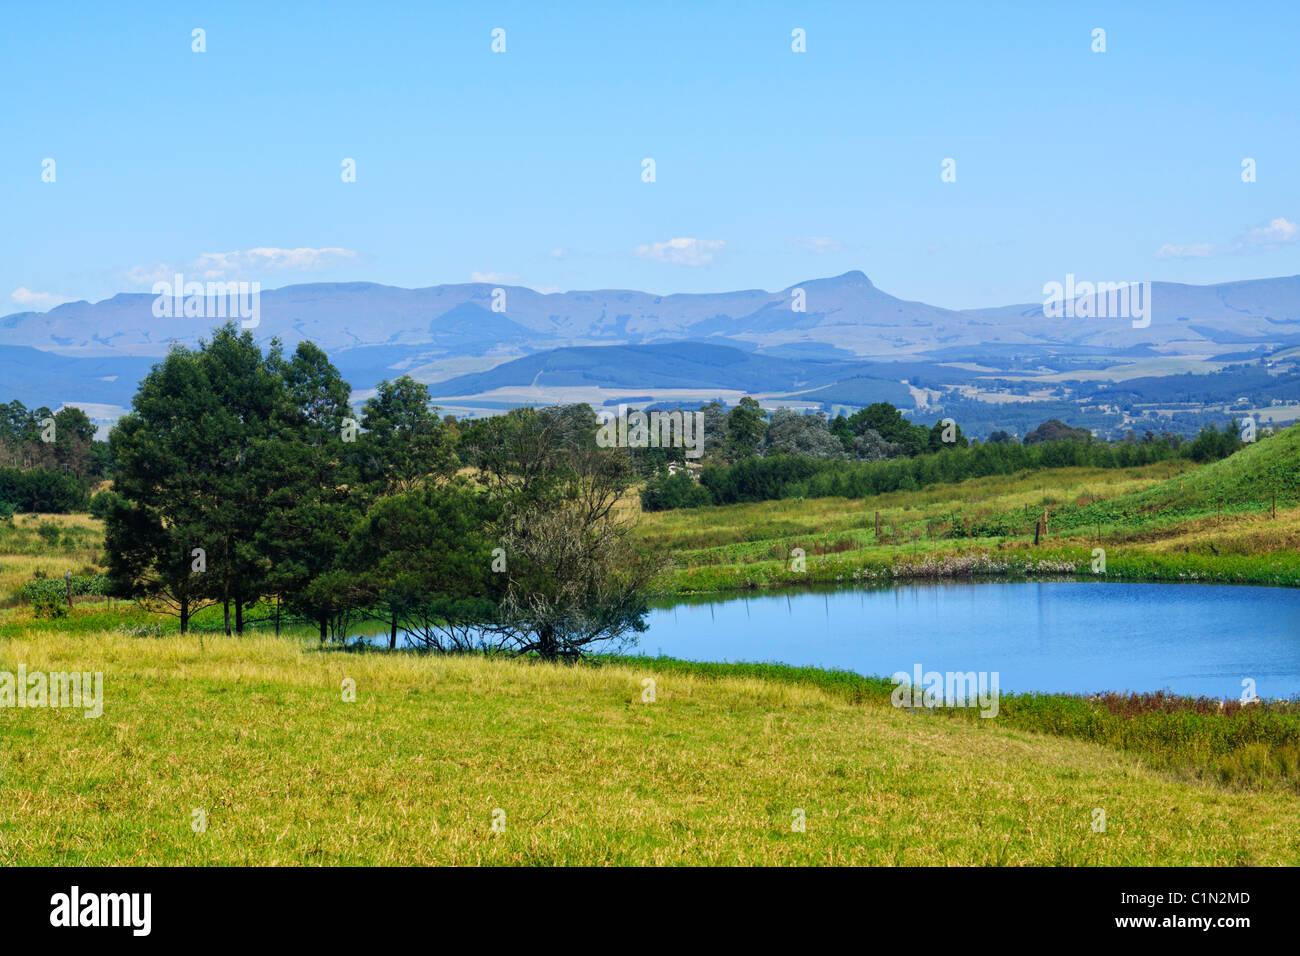 Il paesaggio nelle Midlands, KwaZulu Natal, Sud Africa. Immagini Stock